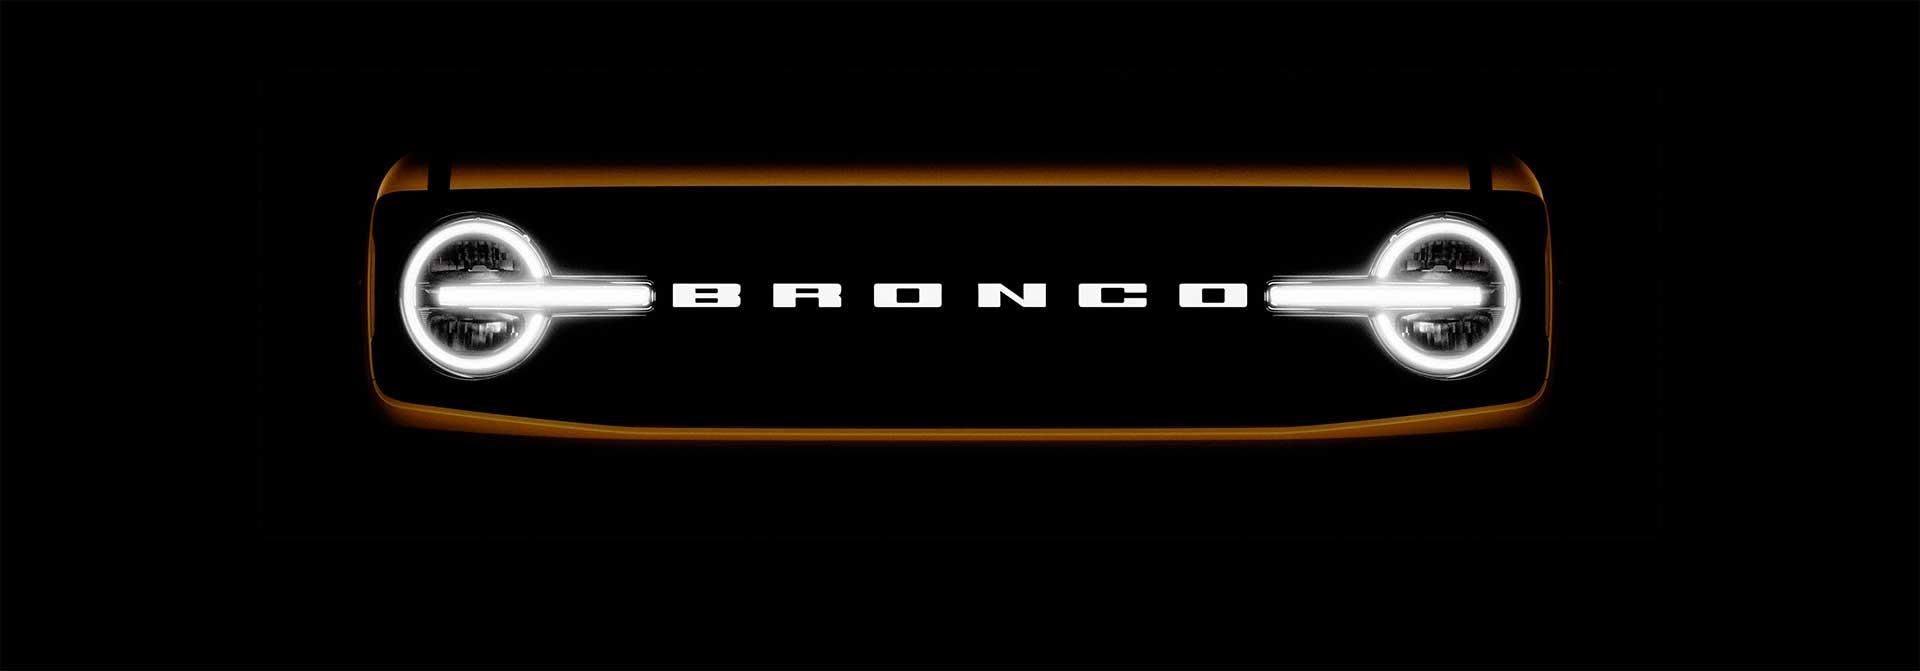 Bronco Tease